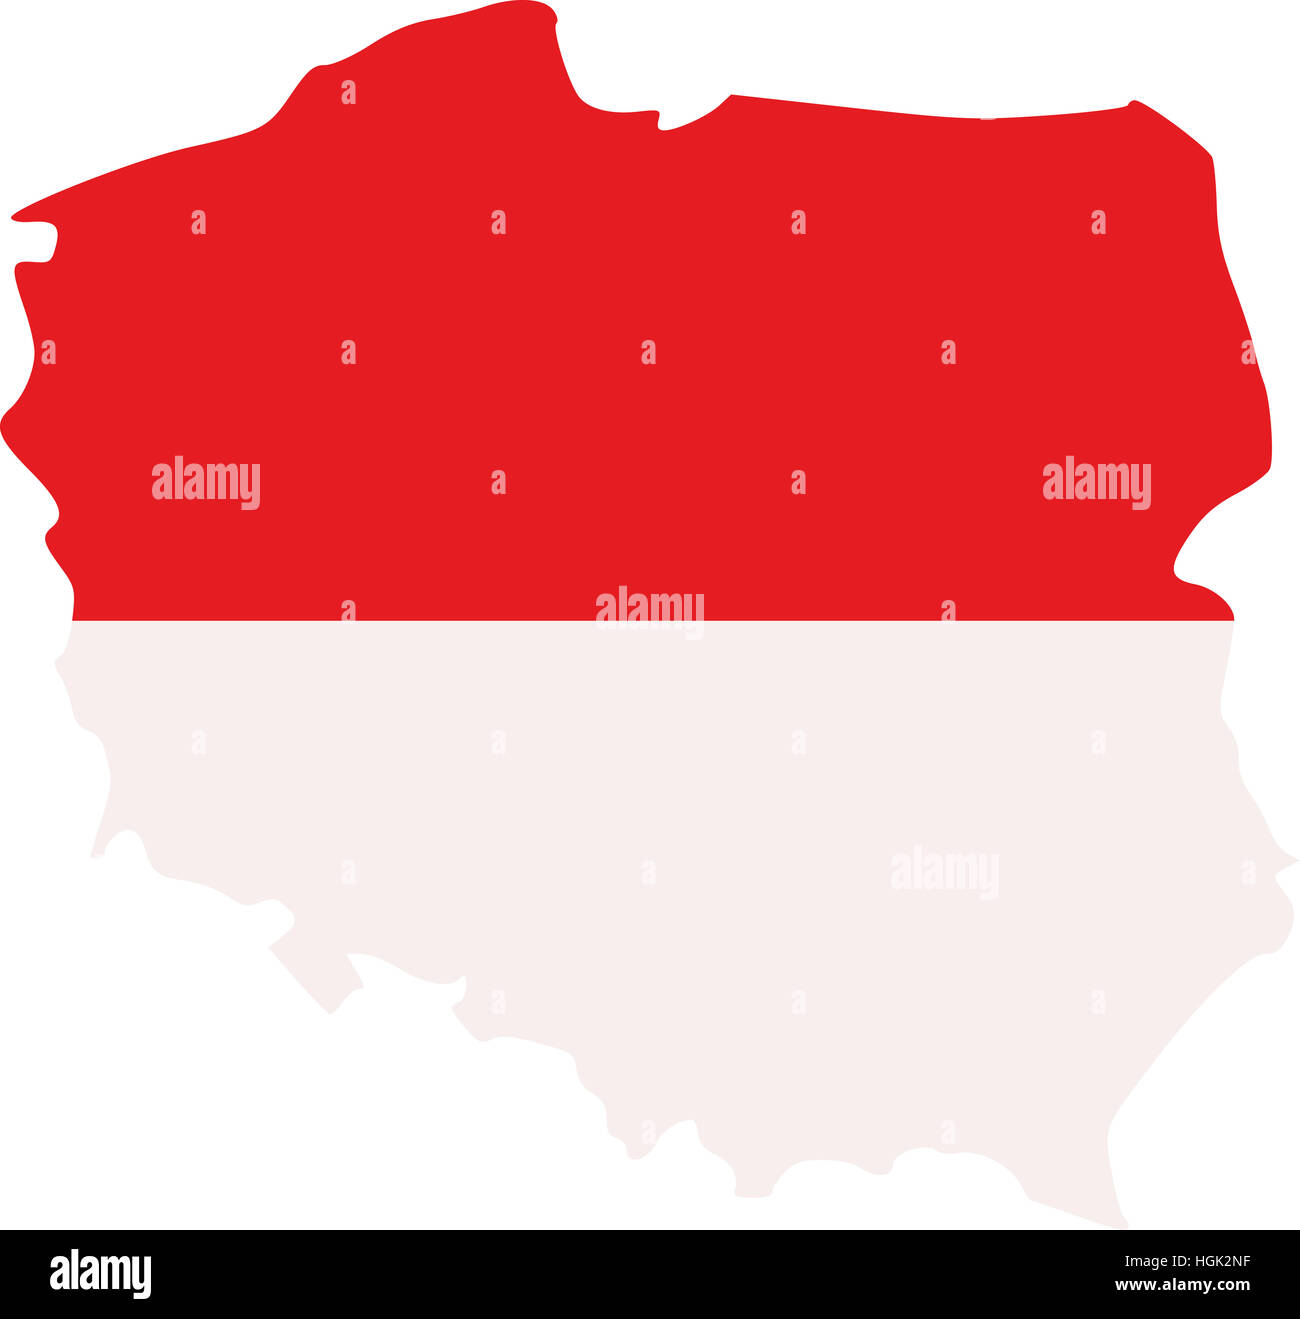 Poland map with flag Stock Photo: 130726331 - Alamy